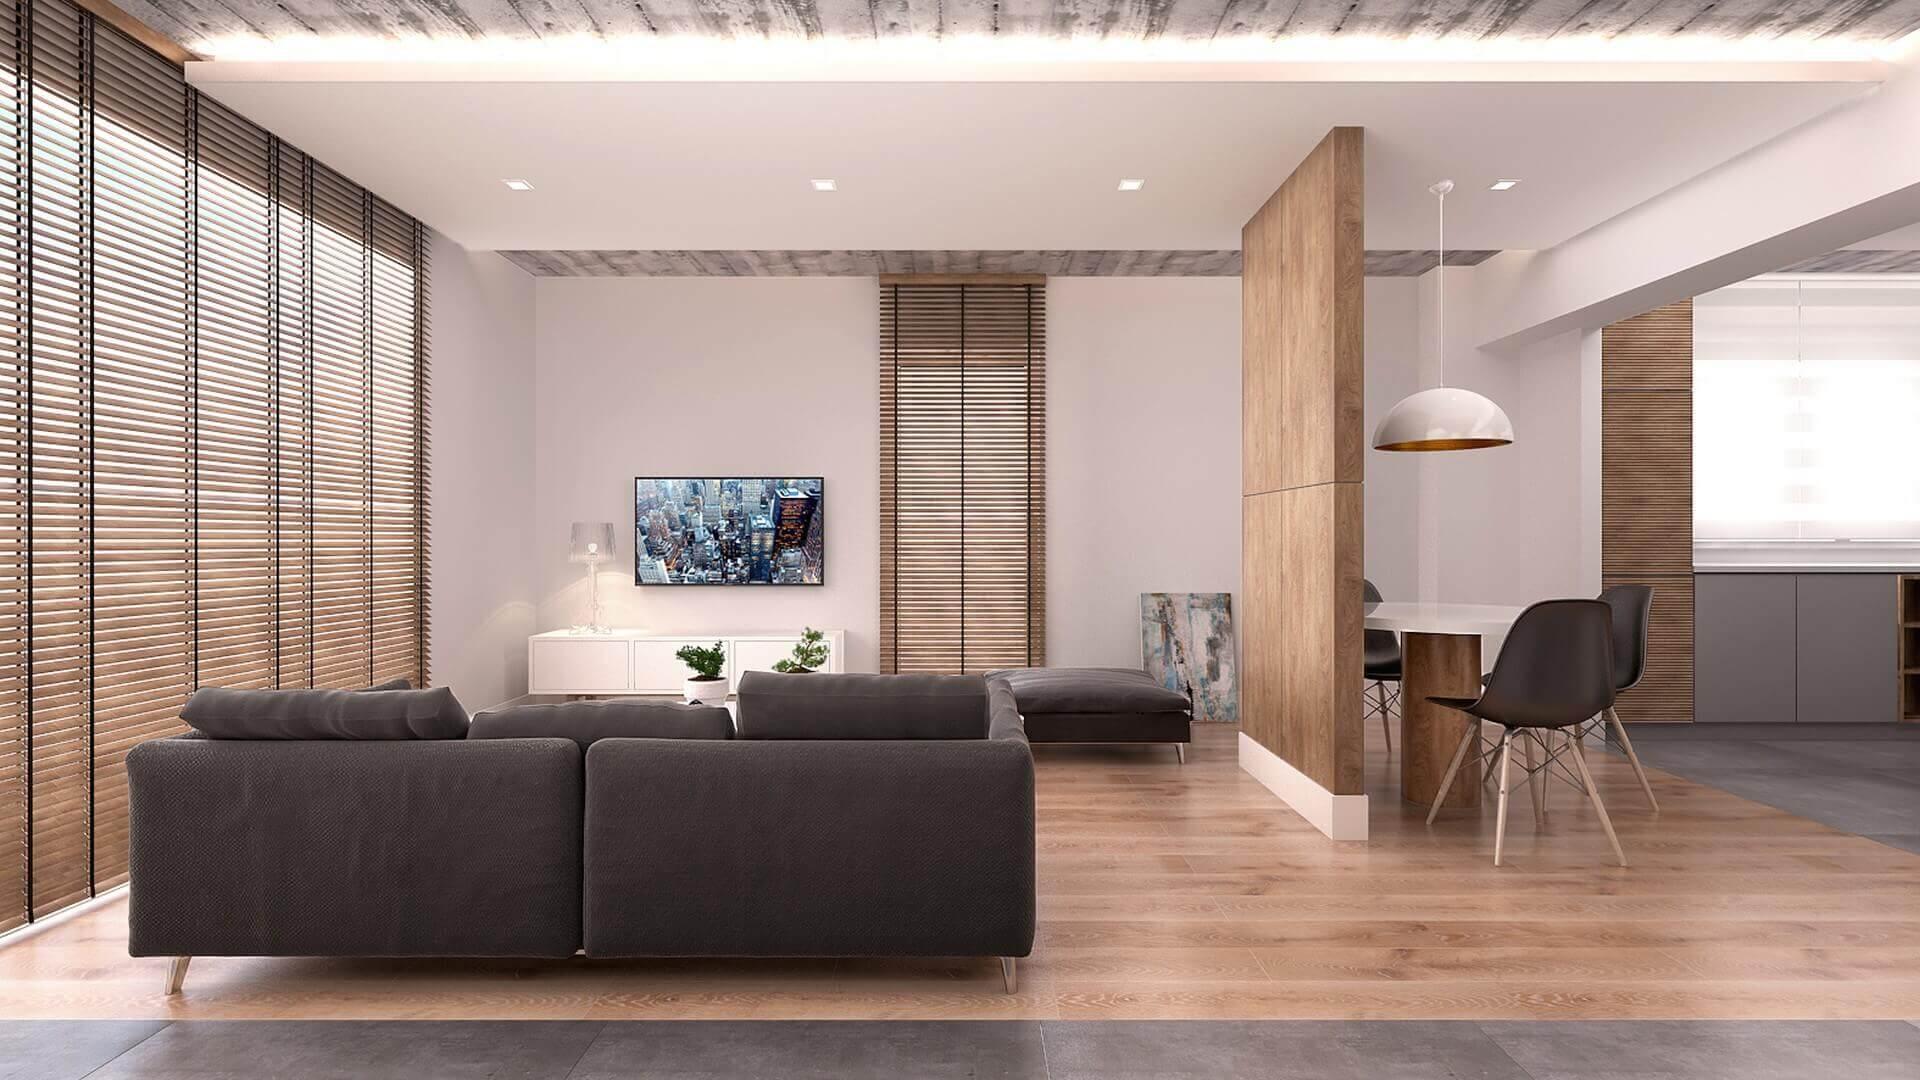 home decoration 3248 AJ Flat Residential